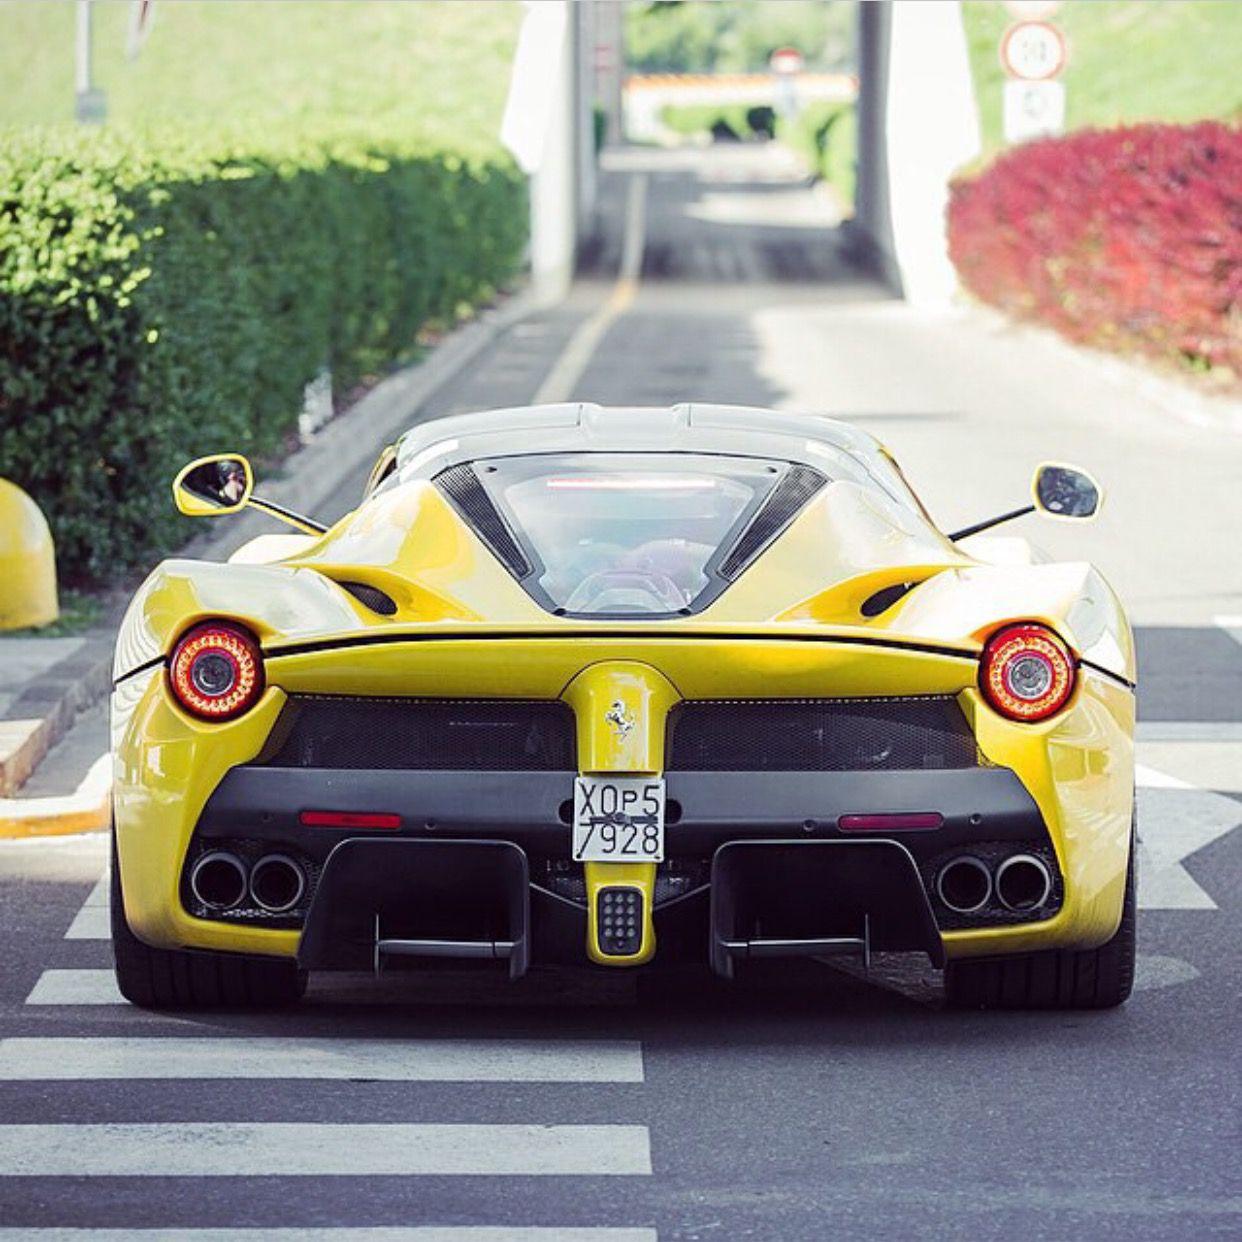 High Quality Ferrari LaFerrari Painted In Giallo Modena Photo Taken By: @philippluecke  On Instagram